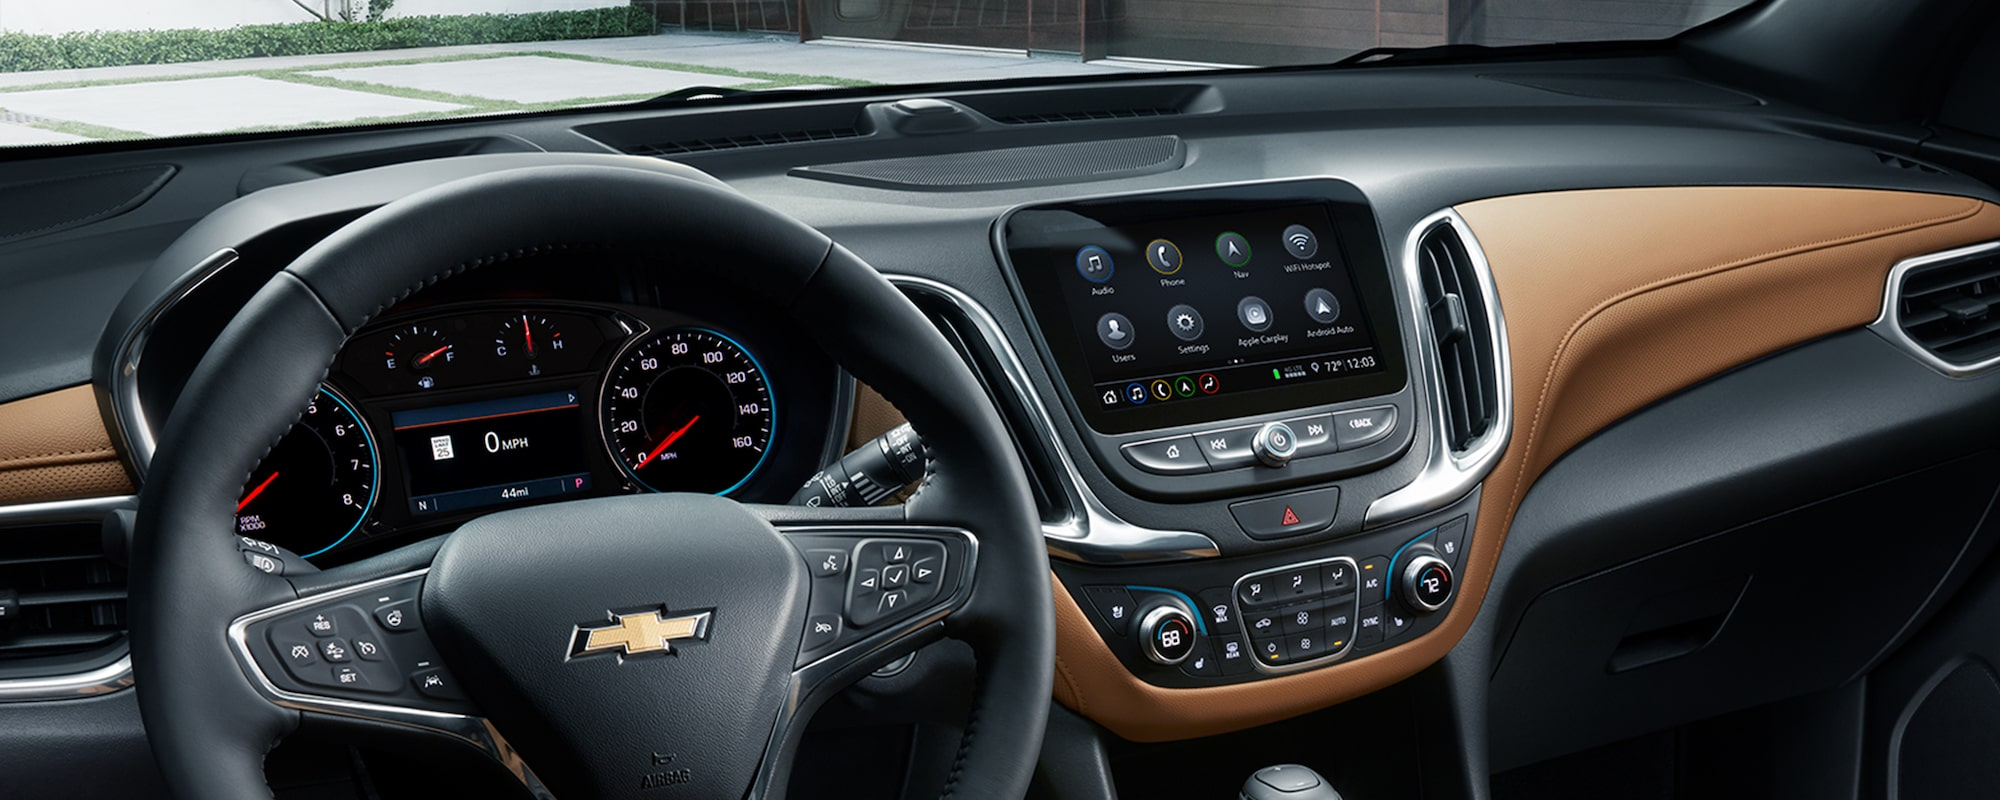 Chevrolet Cruze 2011 Fuse Box - Wiring Diagram